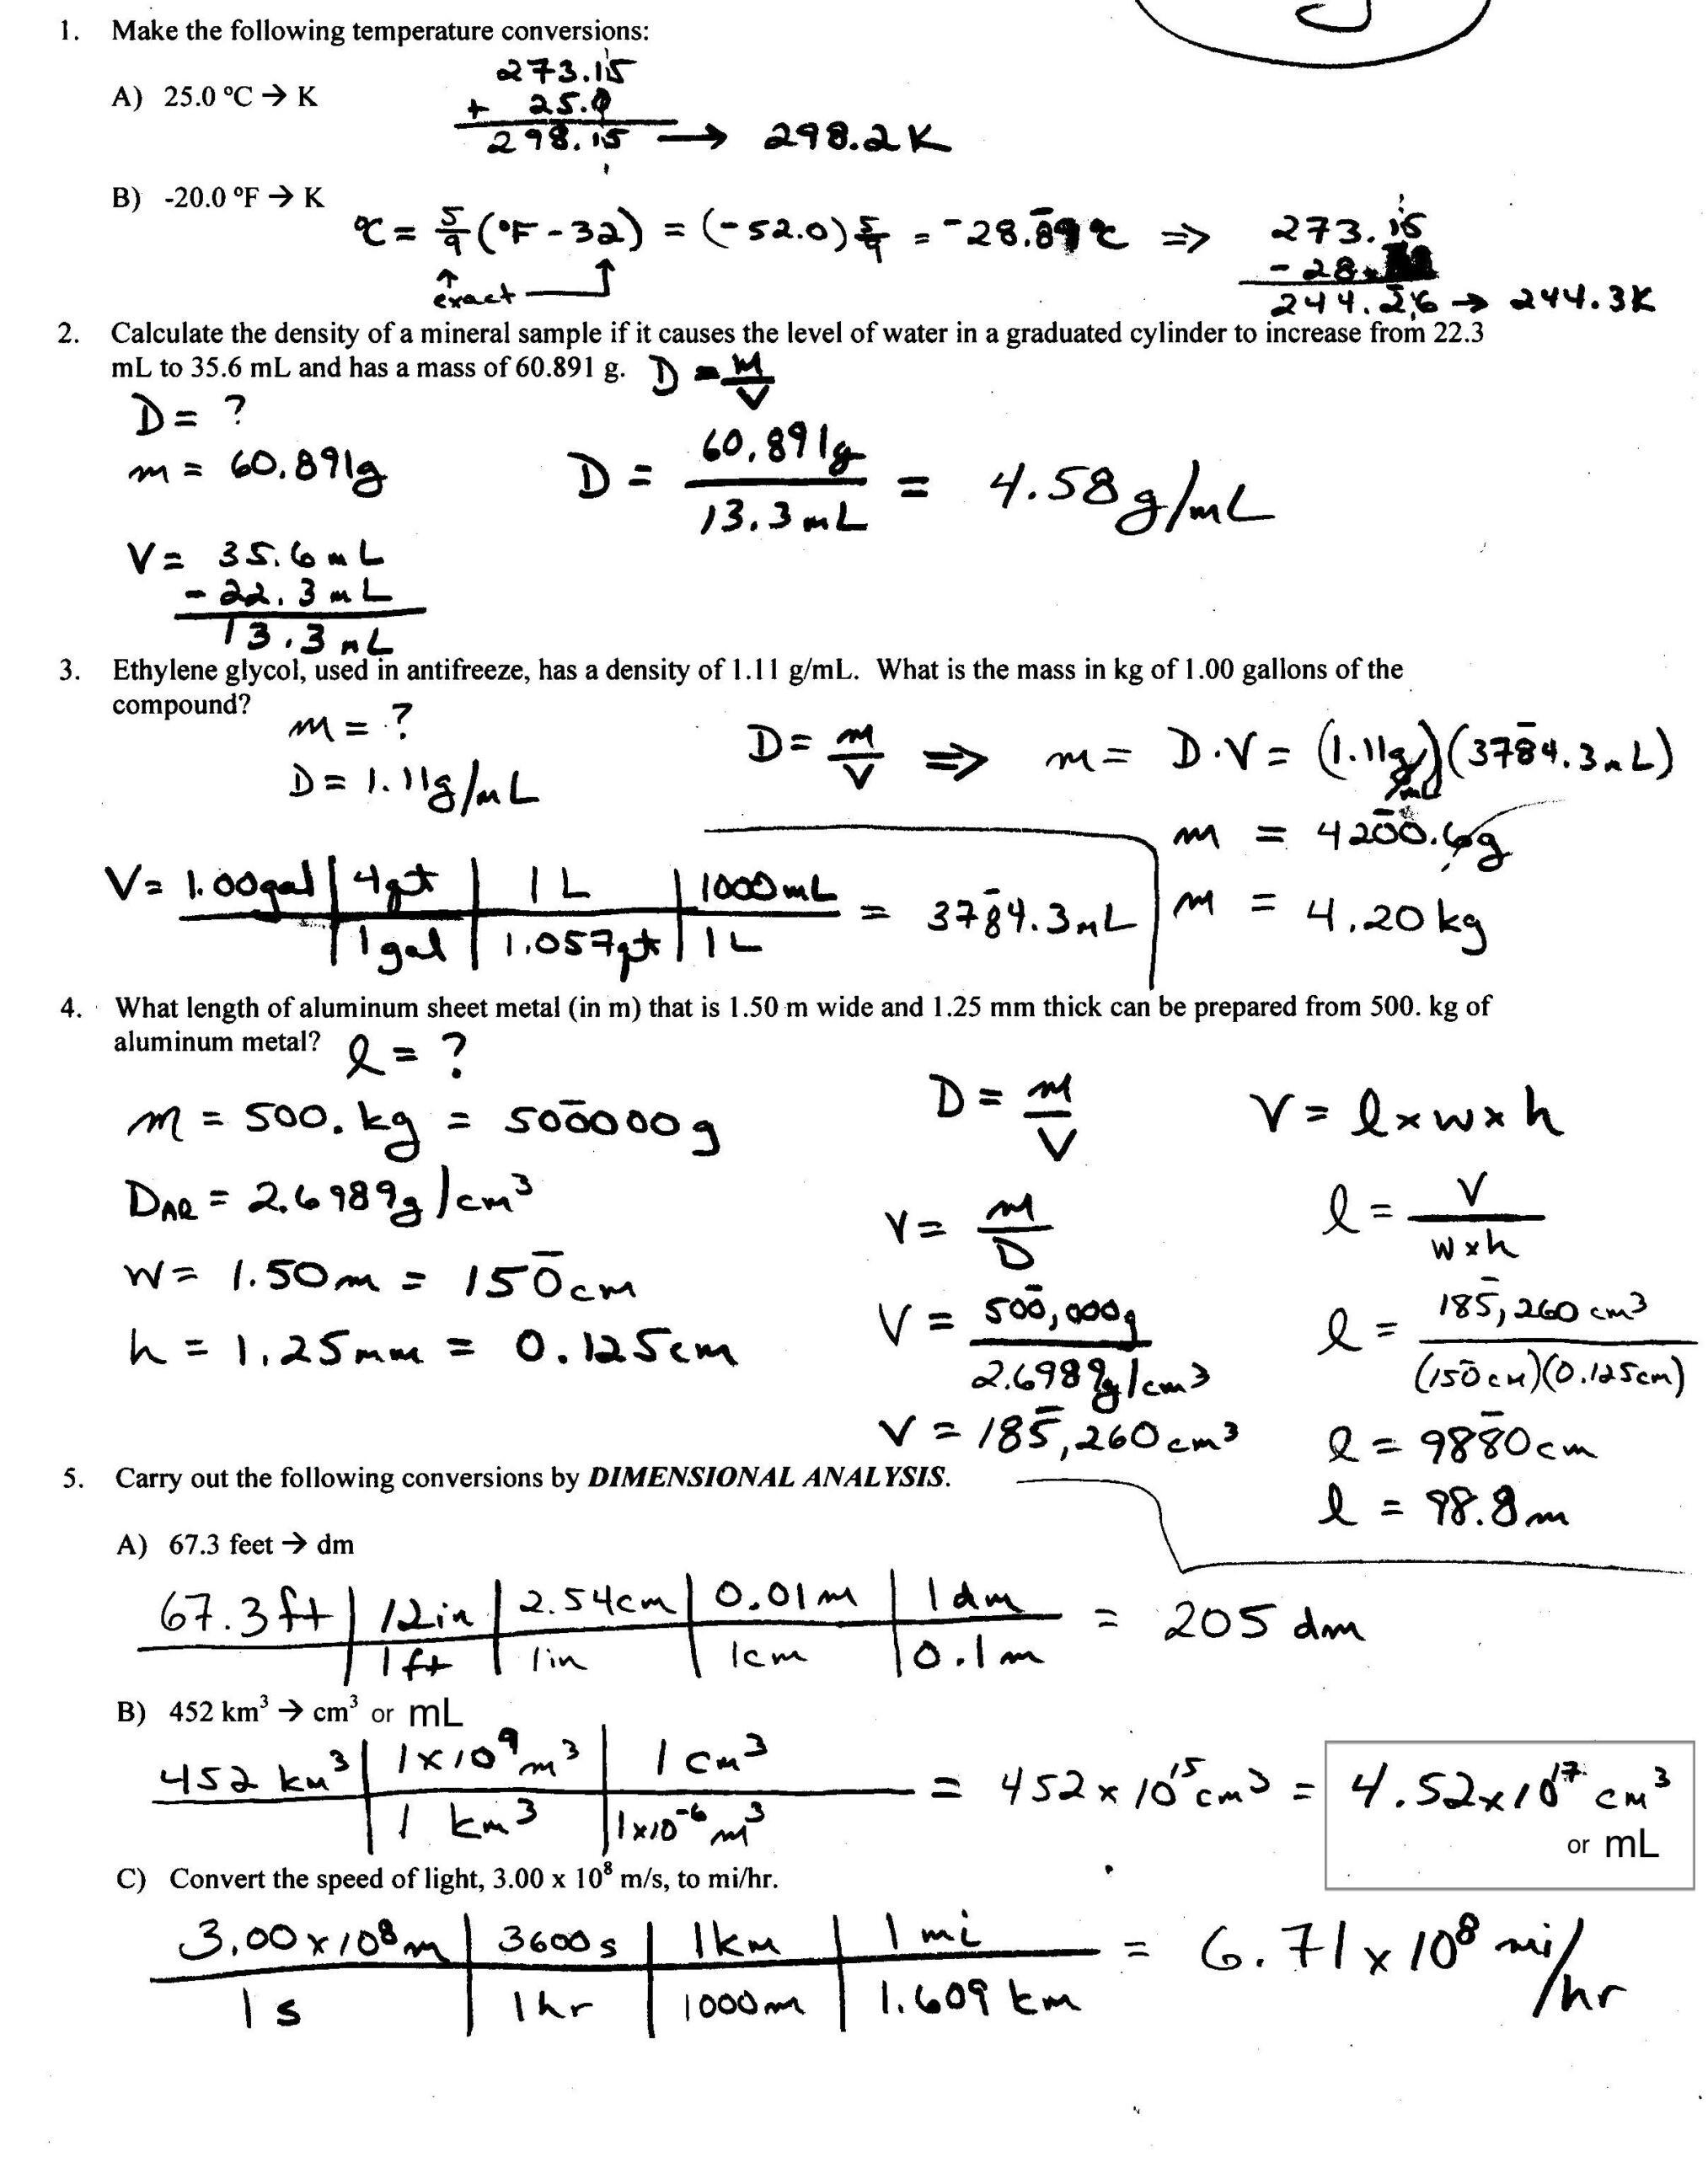 Density Calculations Worksheet 1 Density Worksheet with Answers Calculate Worksheets Answer